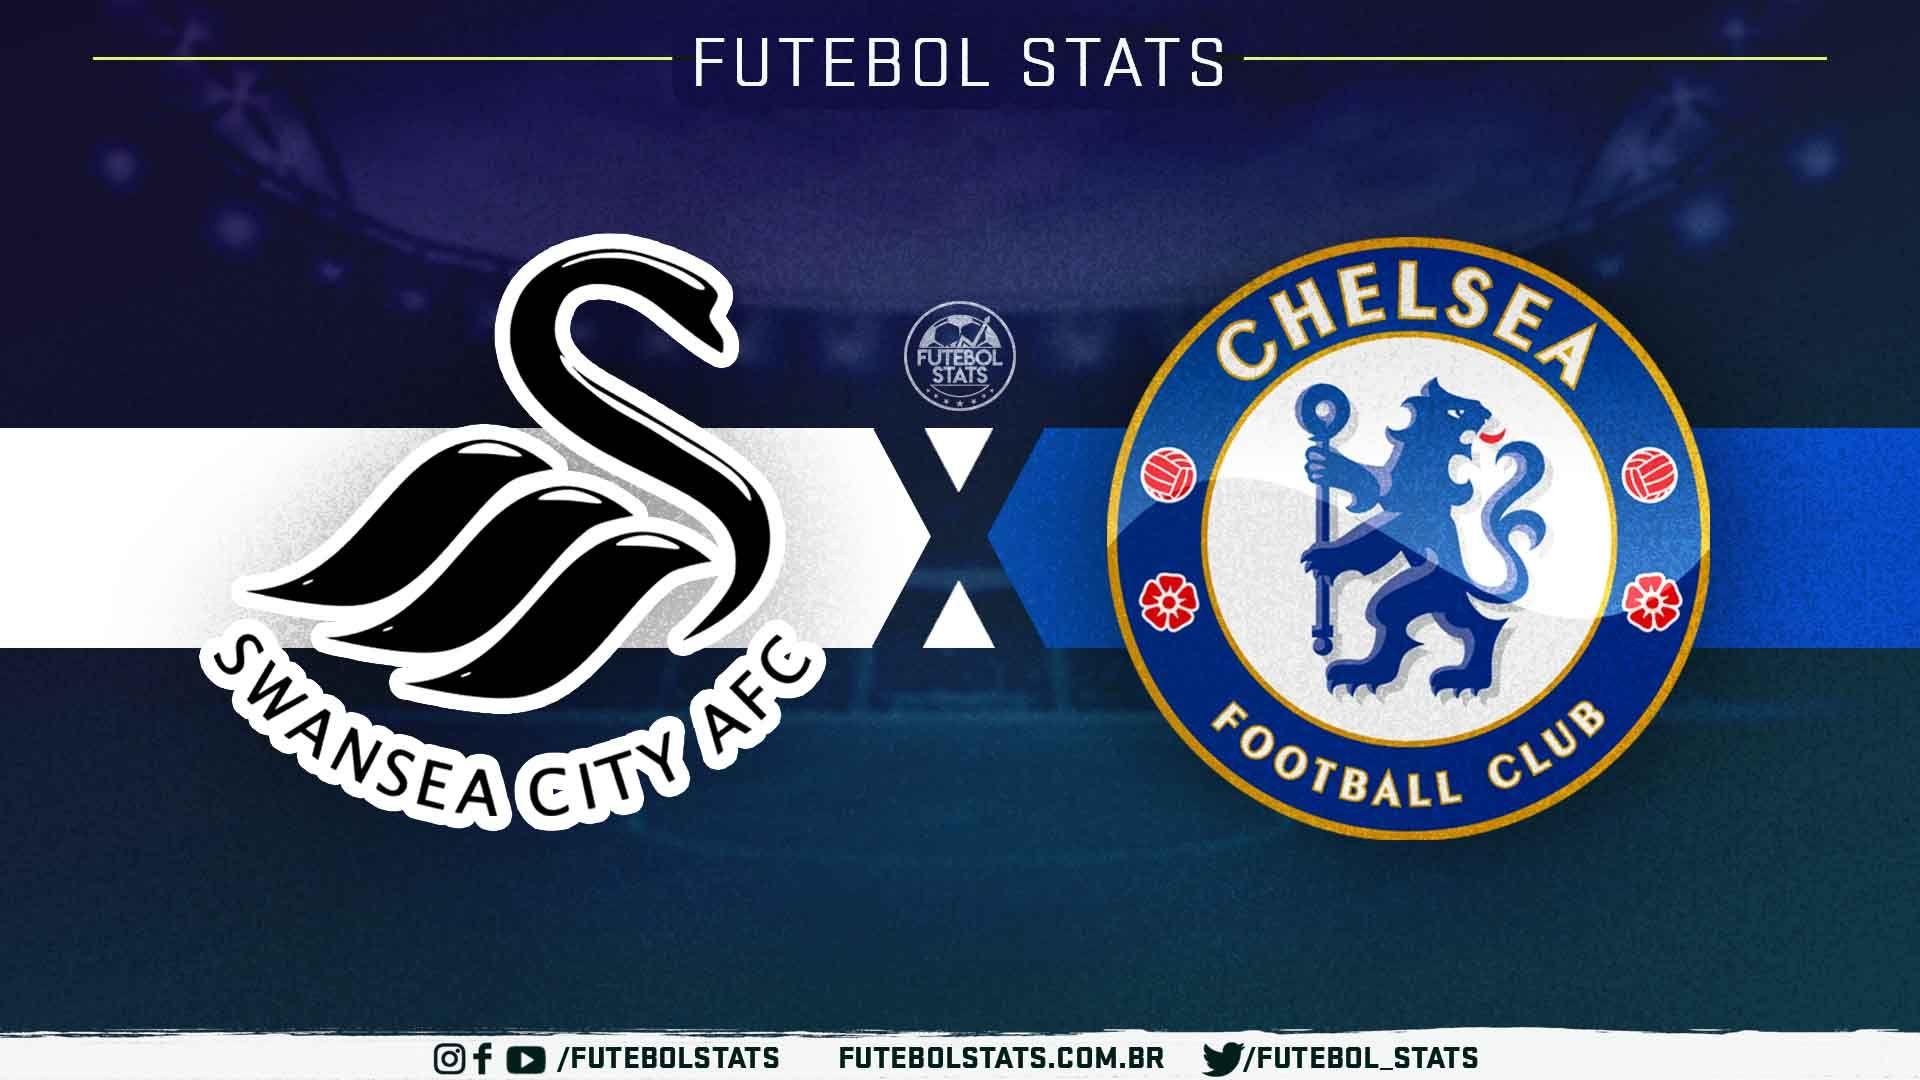 AO VIVO - Swansea x Chelsea em tempo real  40f1c35254101